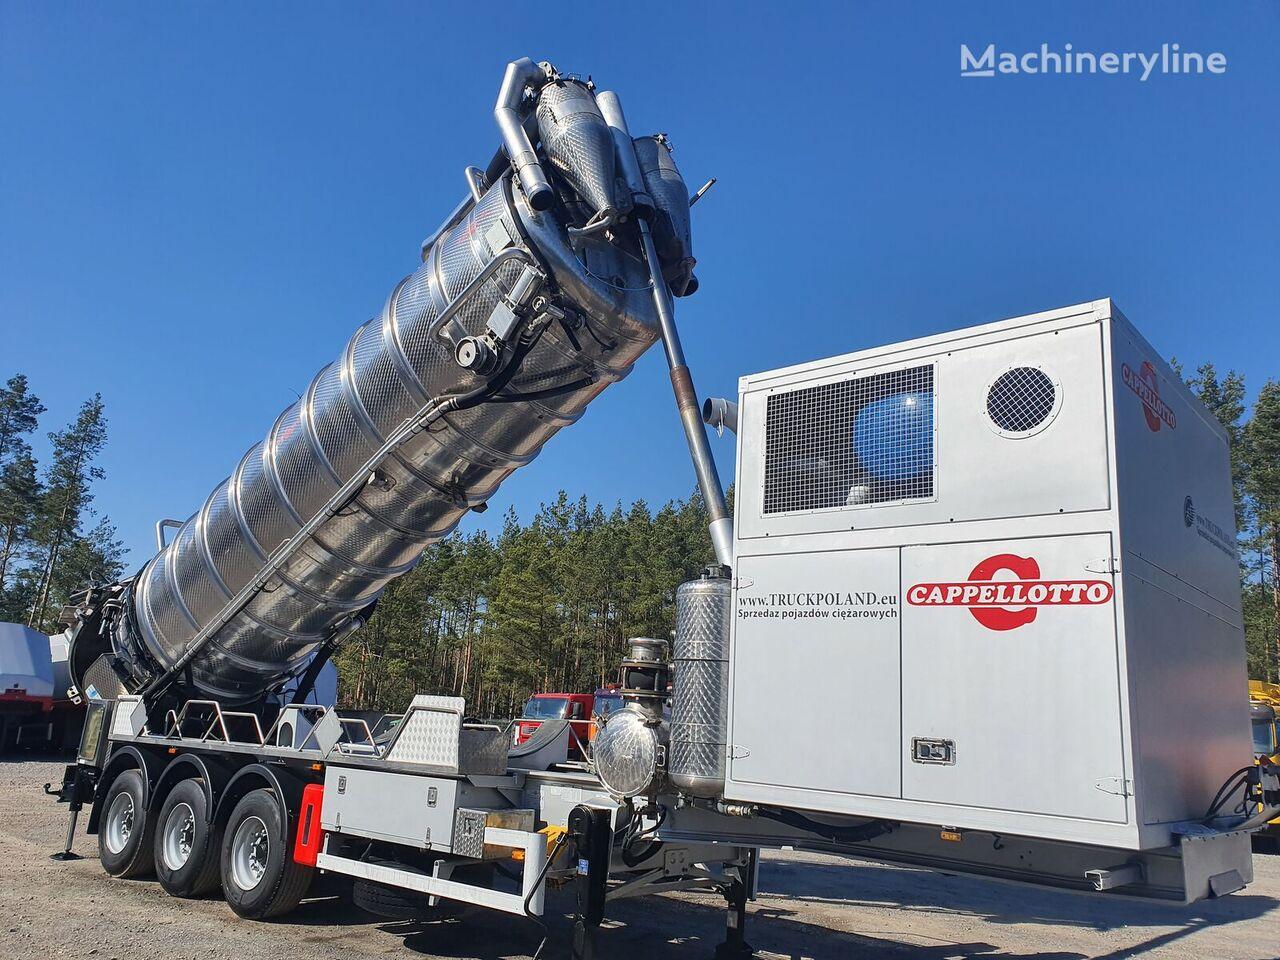 SCANIA CAPPELLOTTO CAP 2500  ADR Specjalistyczna autocysterna do przewo camión de vacío